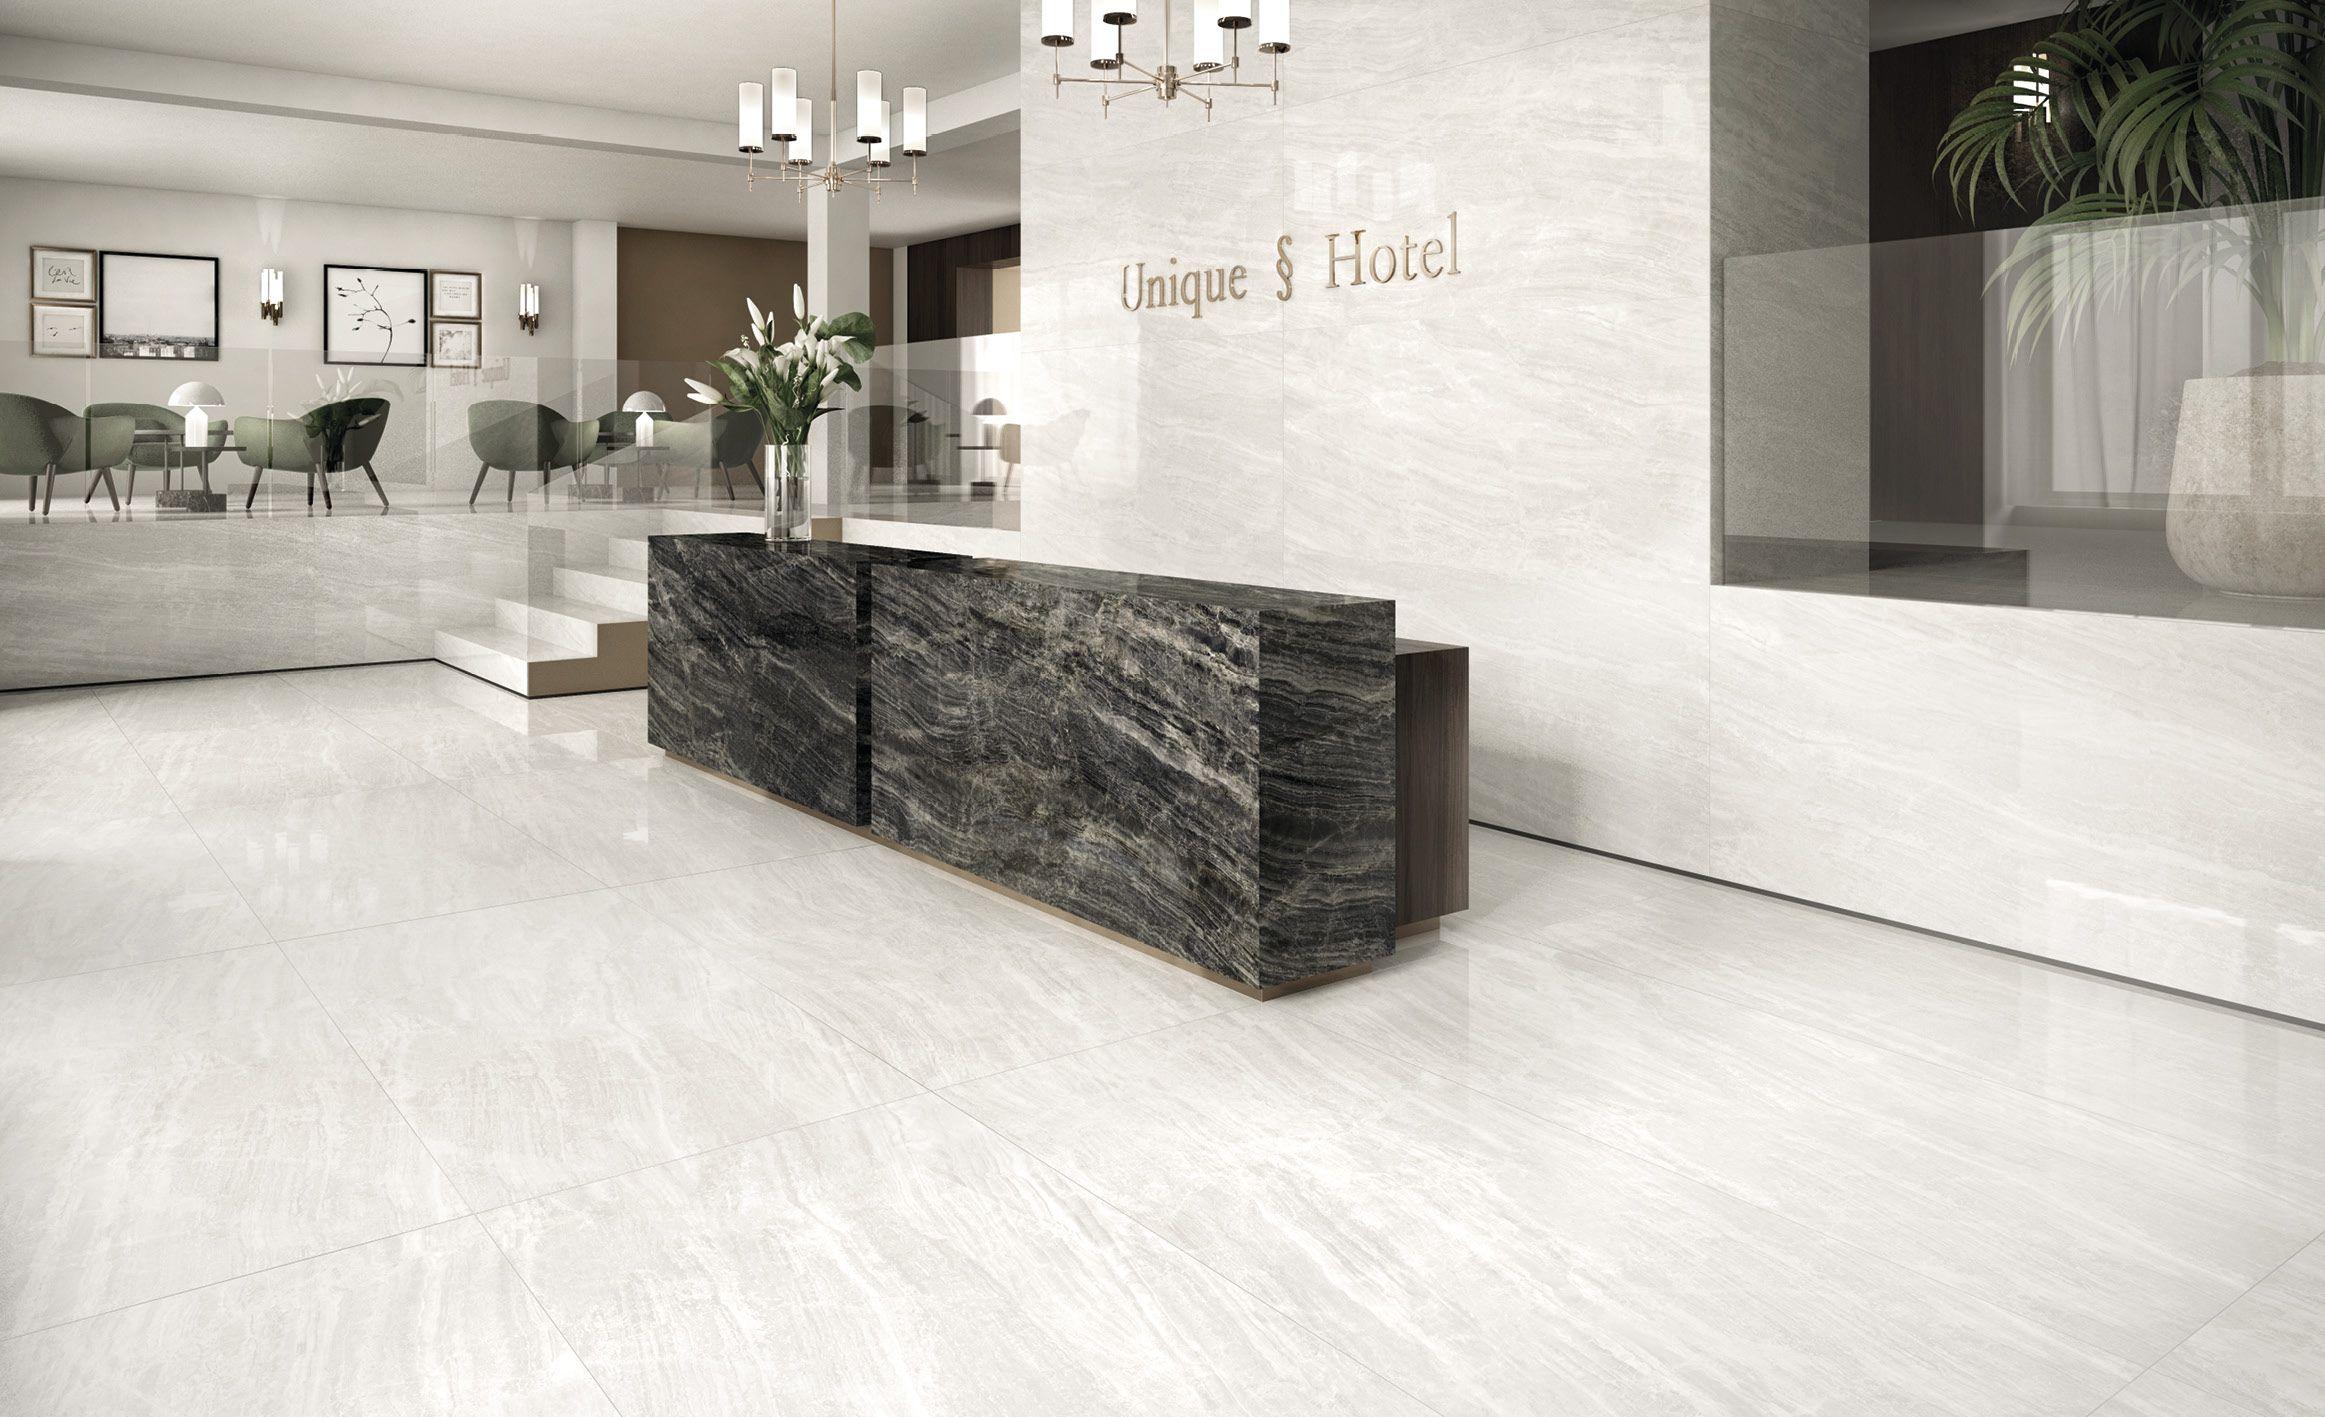 4428 Marble Look Tile Hotel Lobby Design Lobby Design Marble Look Tile